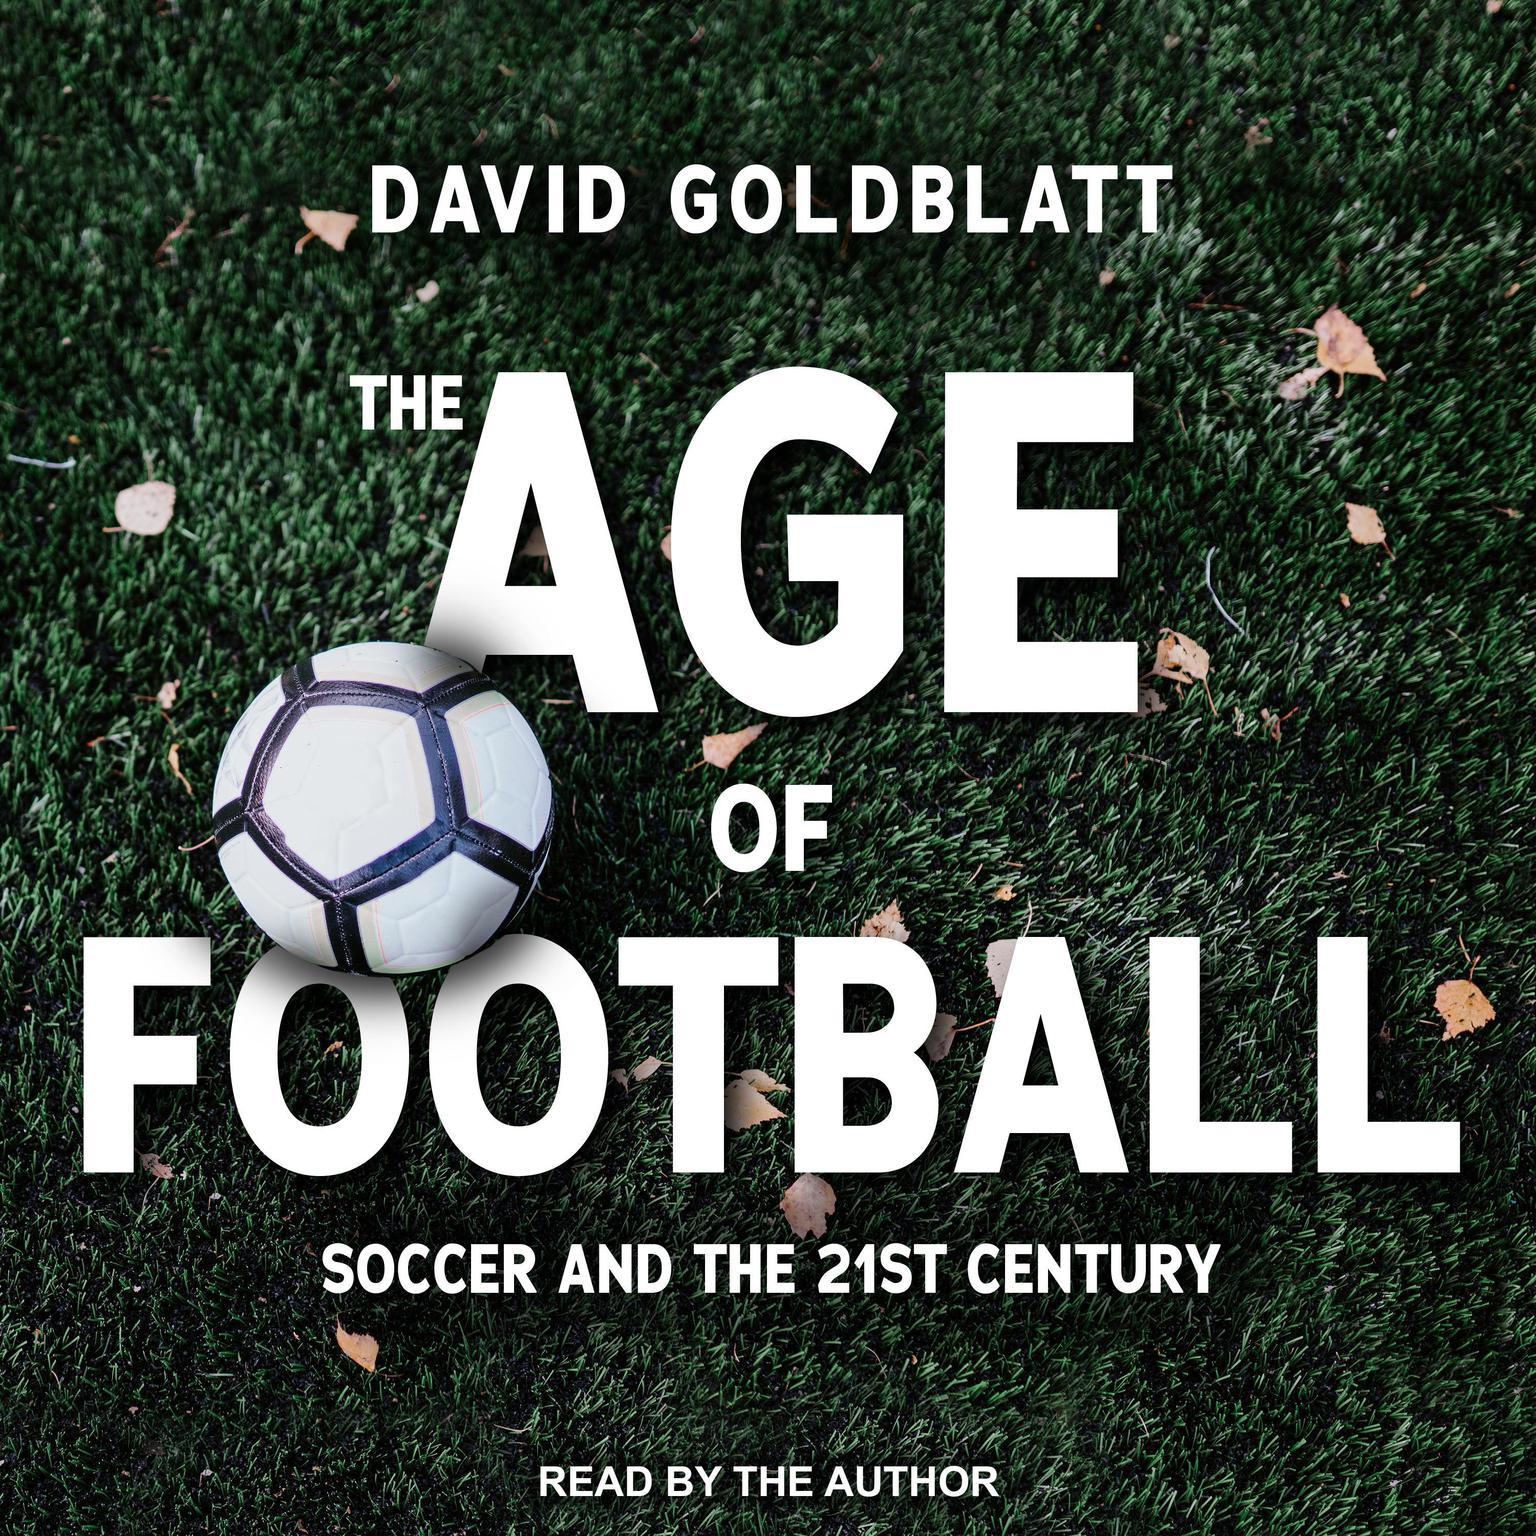 The Age of Football: Soccer and the 21st Century Audiobook, by David Goldblatt